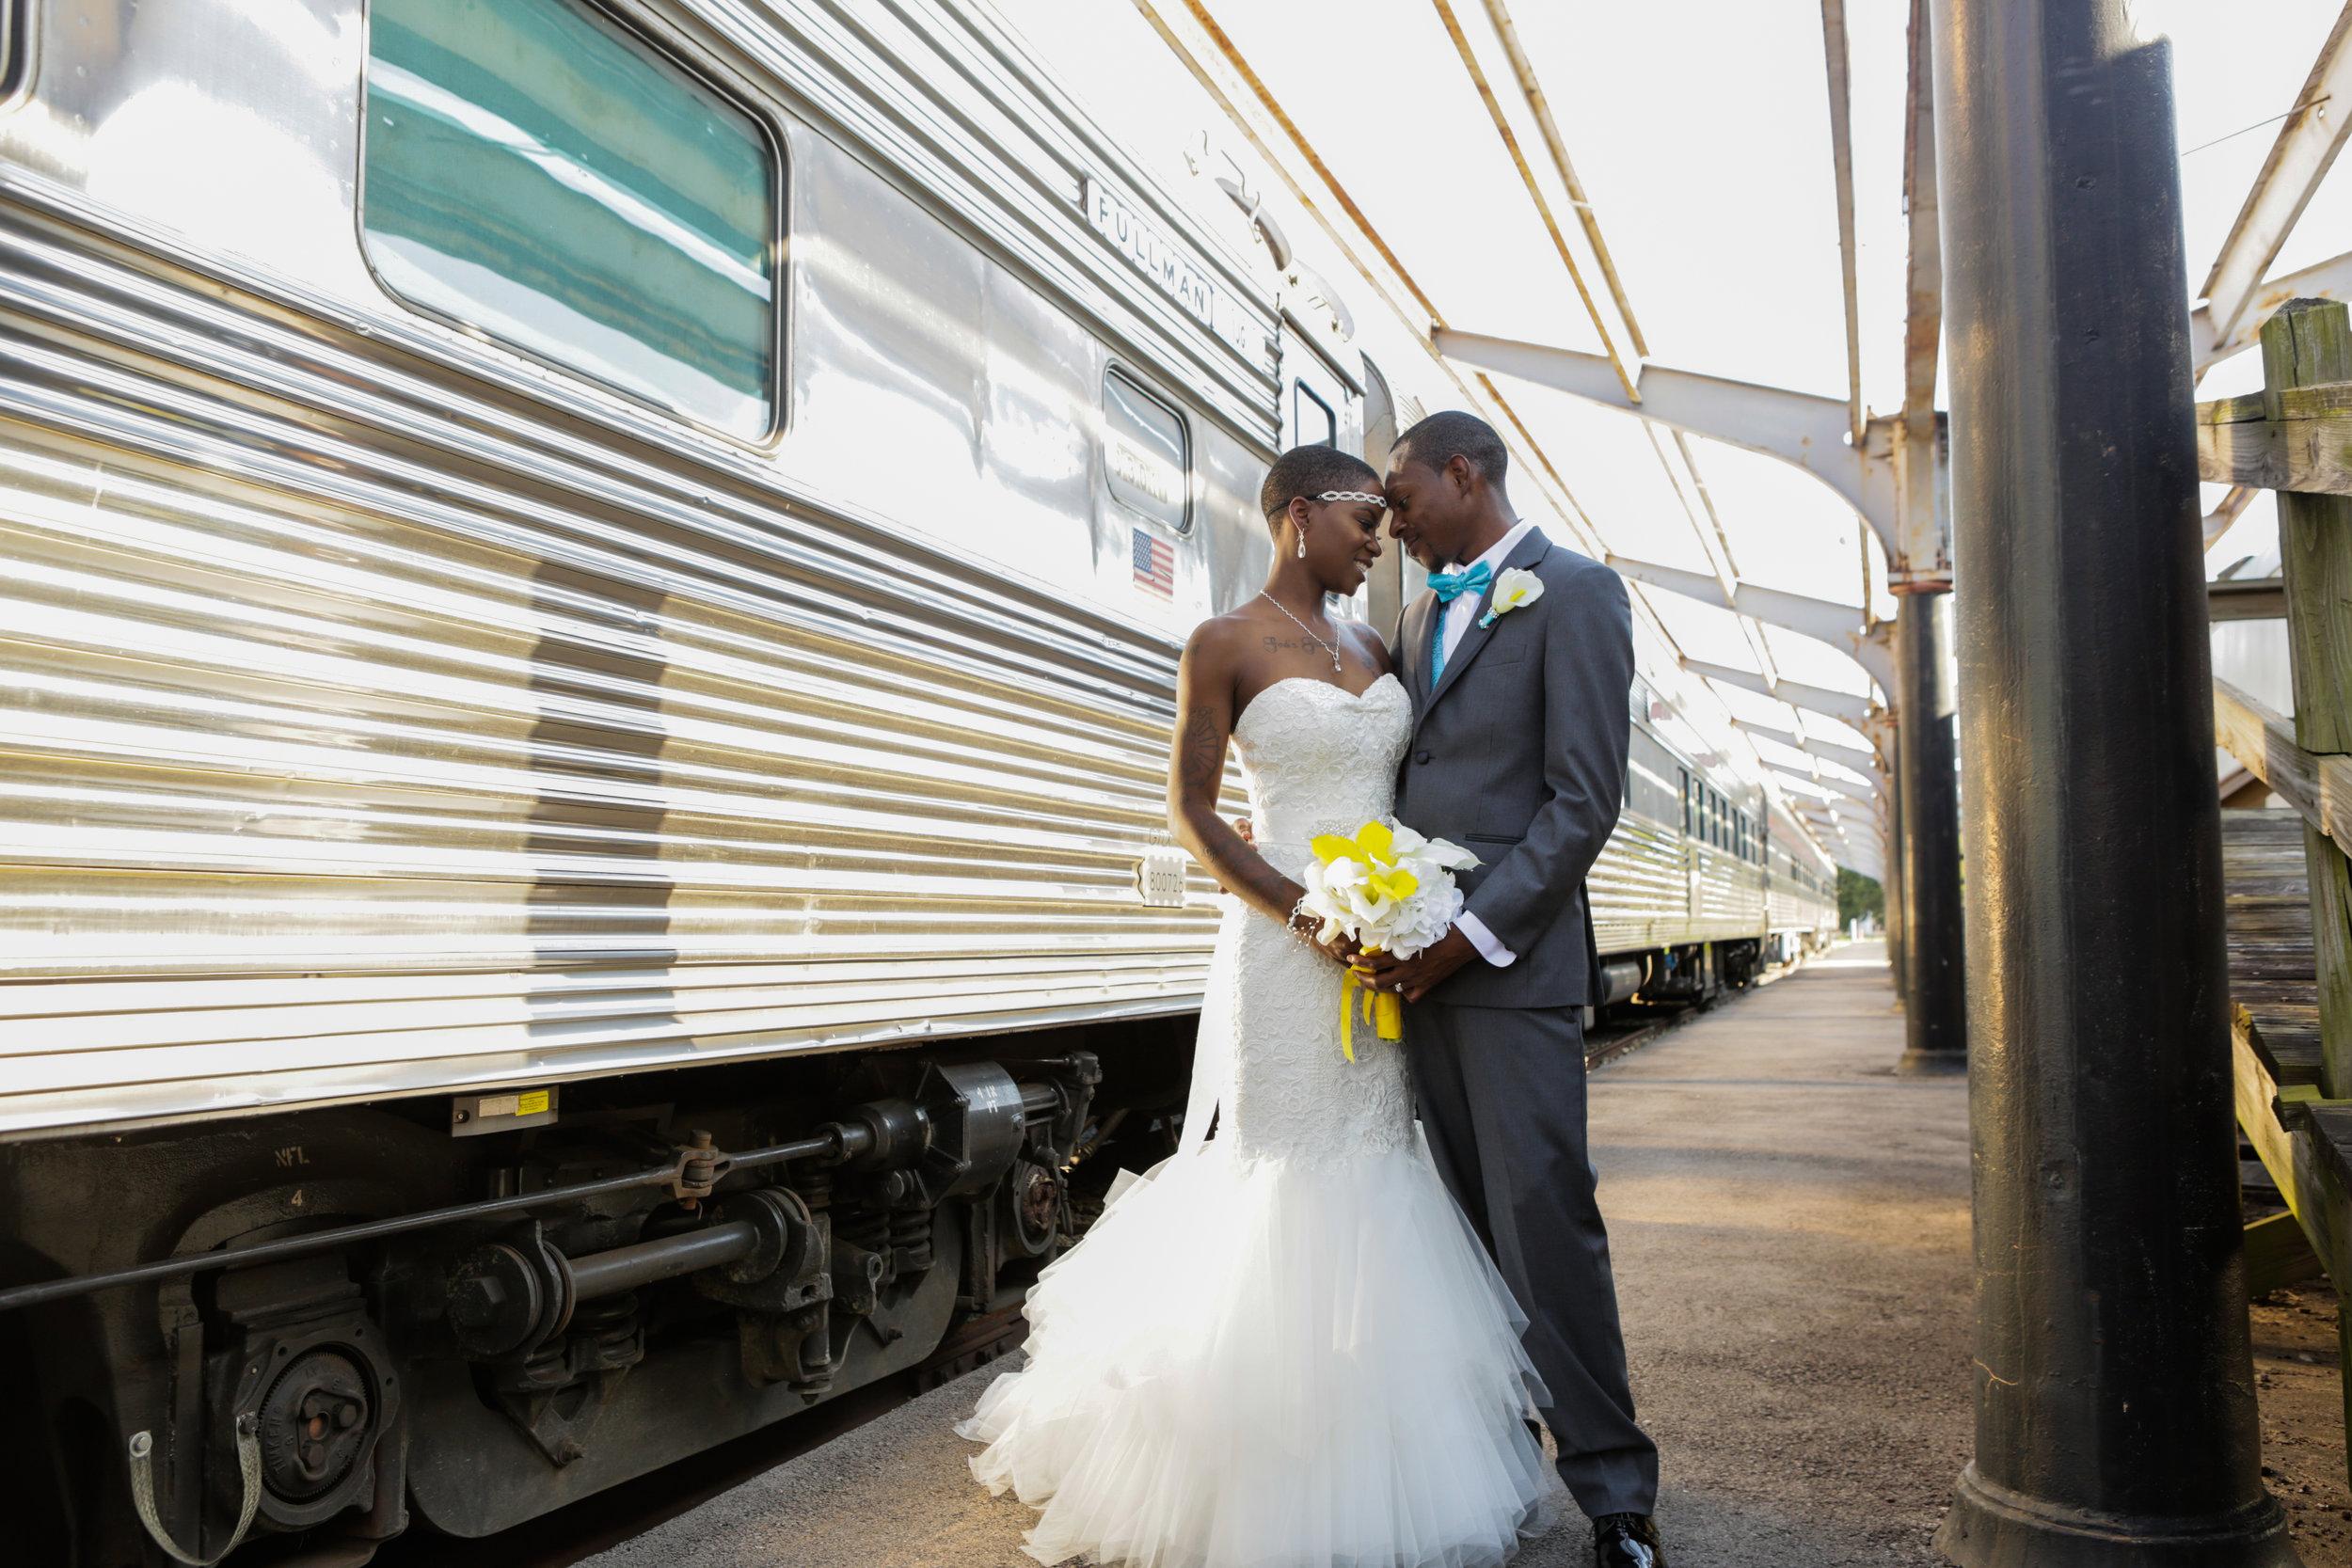 St. Louis Photographer St. Charles Photographer Engagement Wedding Photographer (7).jpg